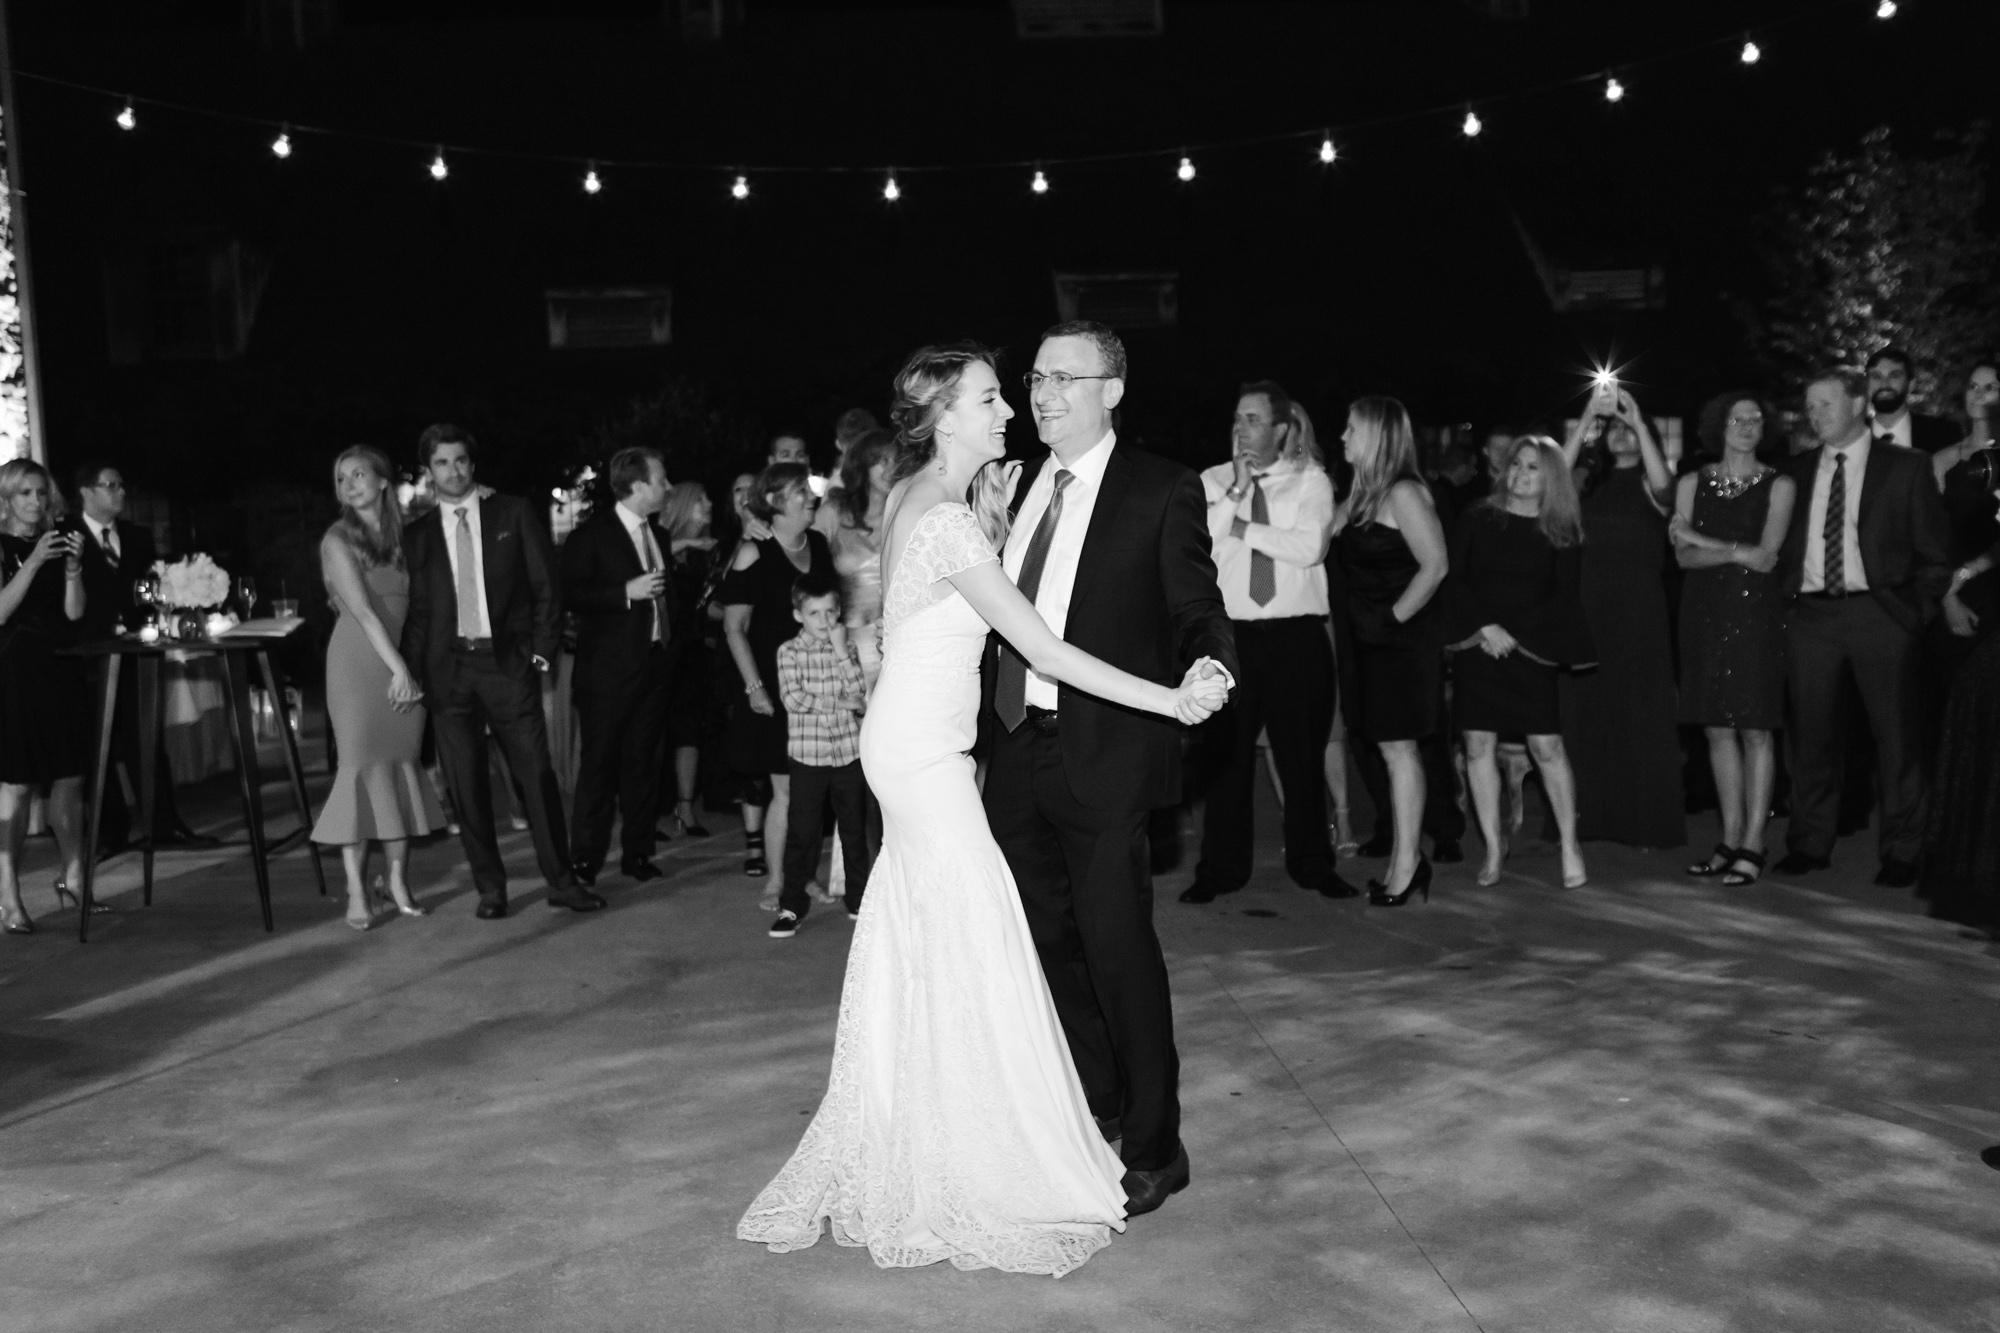 66_Jessica_Ted_Blue_Hill_Stone_Barns_Wedding_Pocantico_NY_Tanya_Salazar_Photography_199.jpg